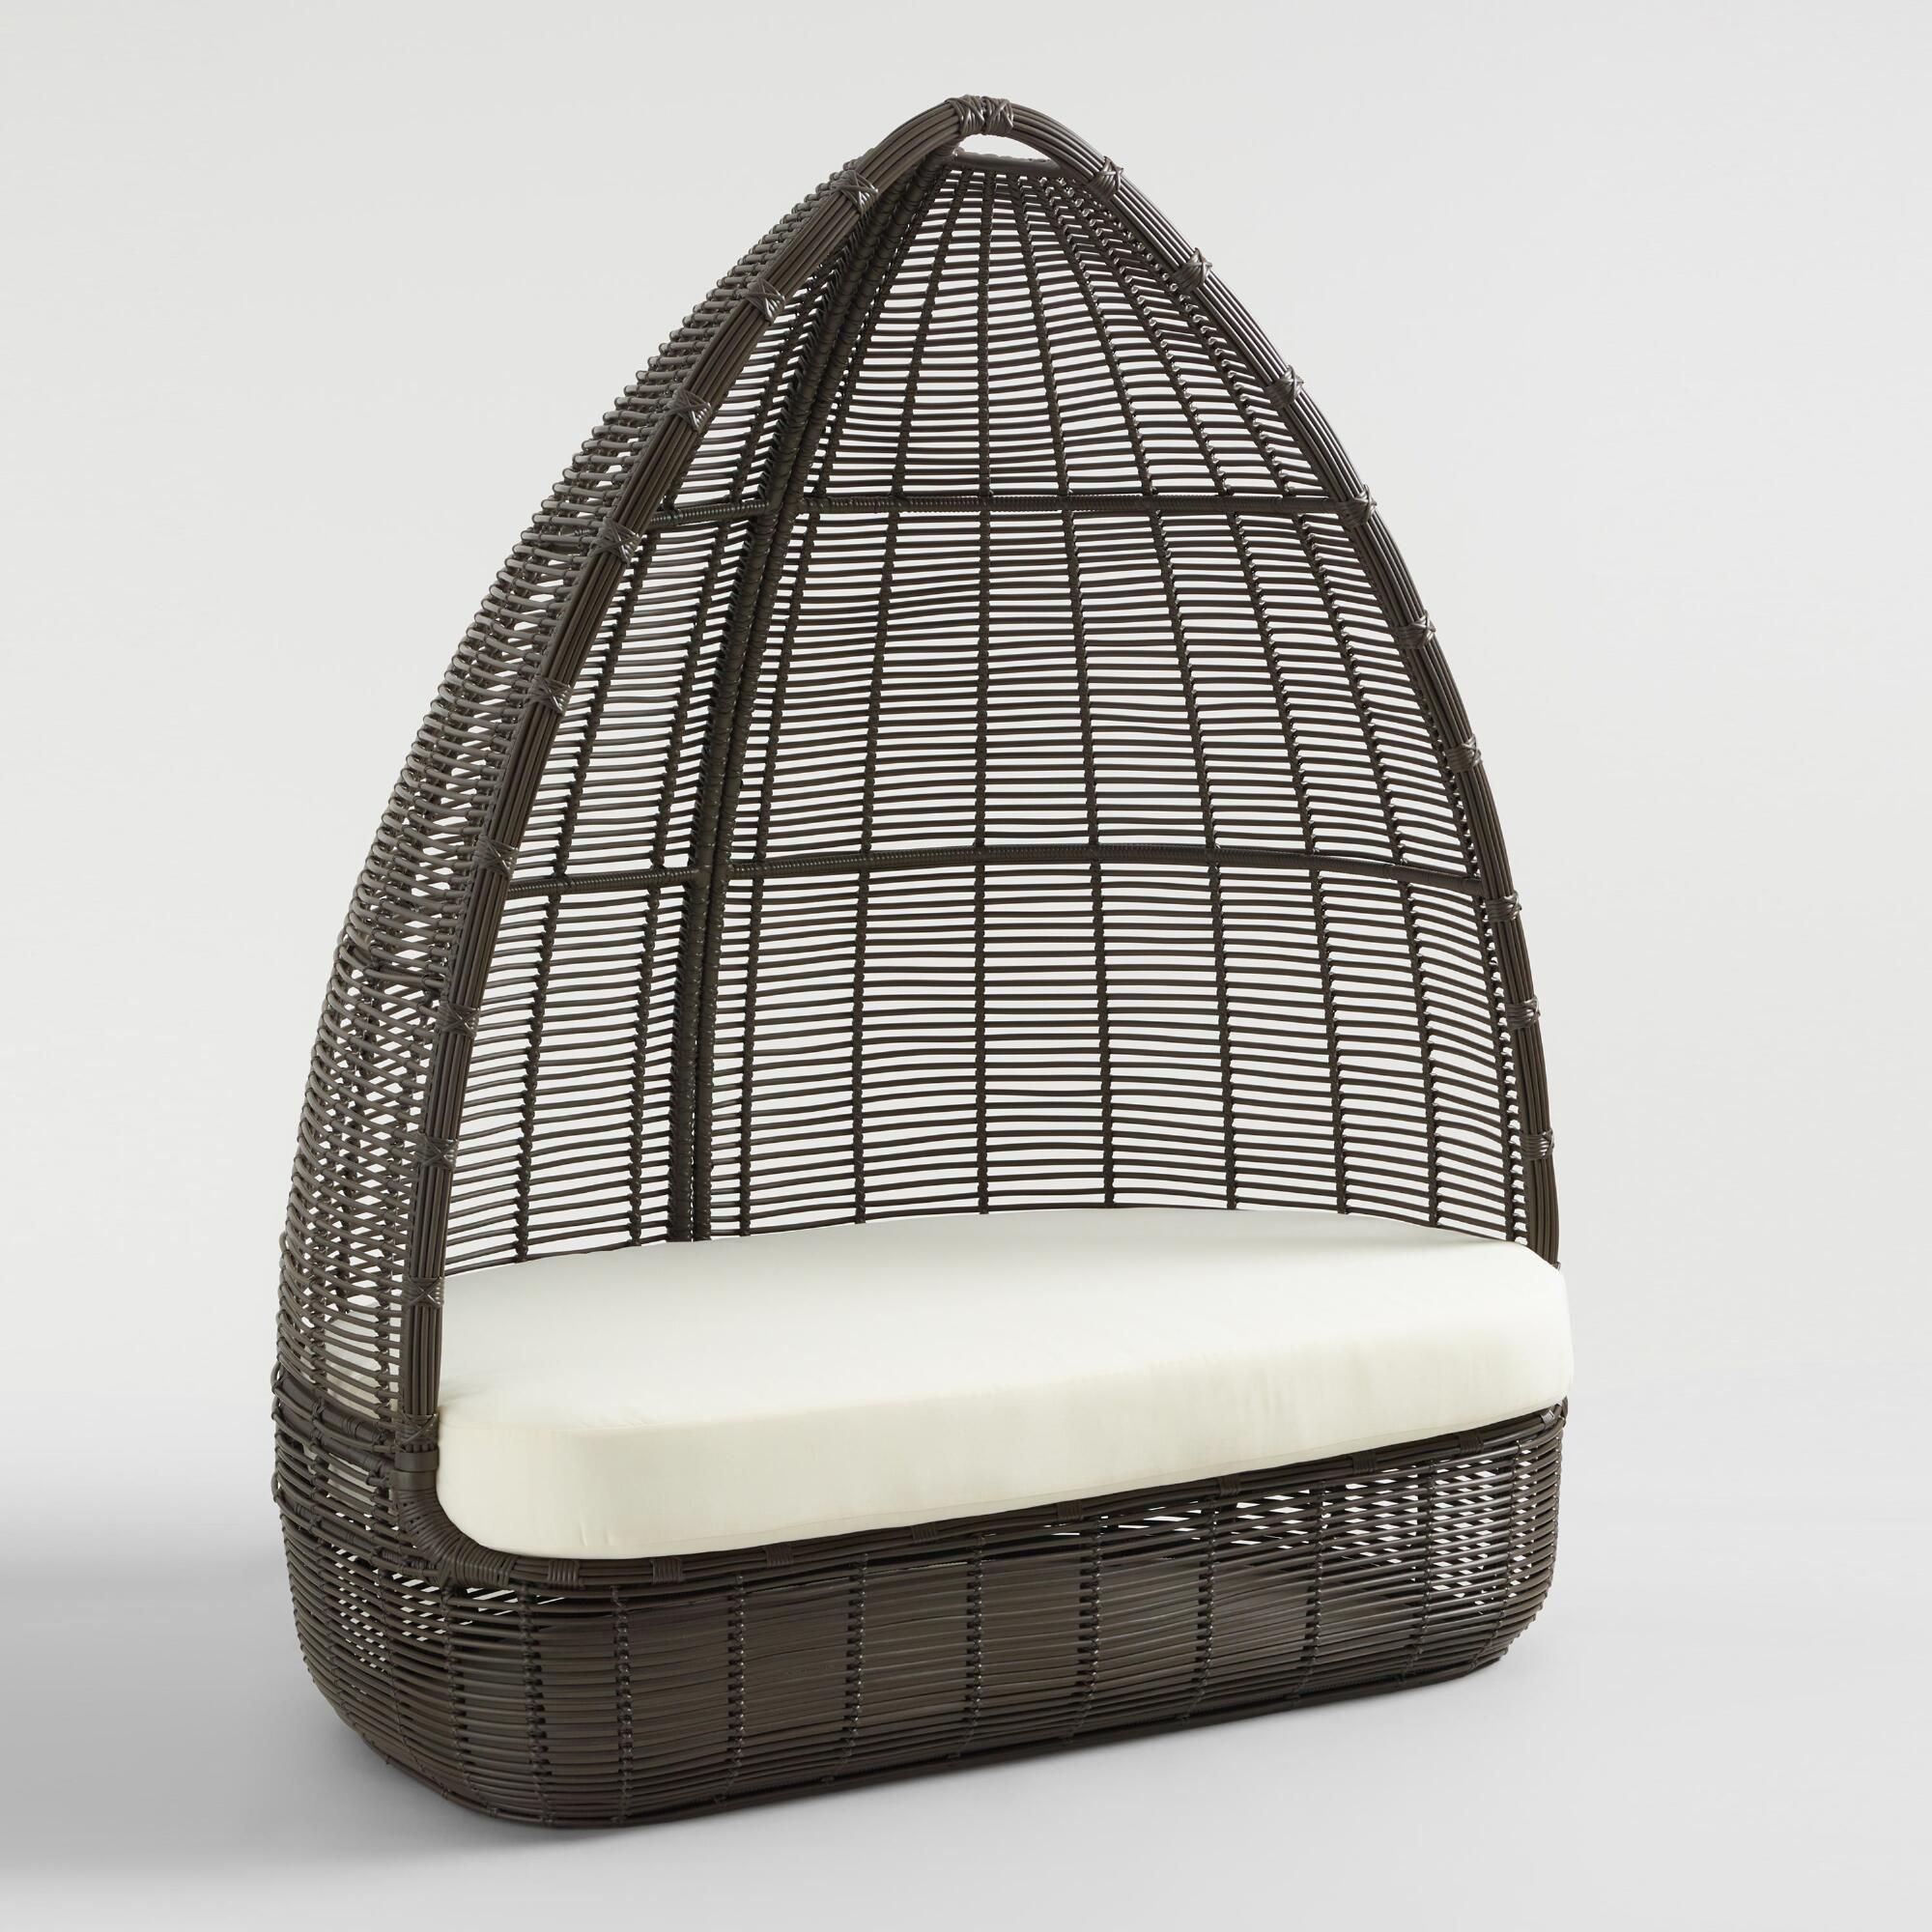 Dark Gray Weather Wicker Maximus Egg Chair World